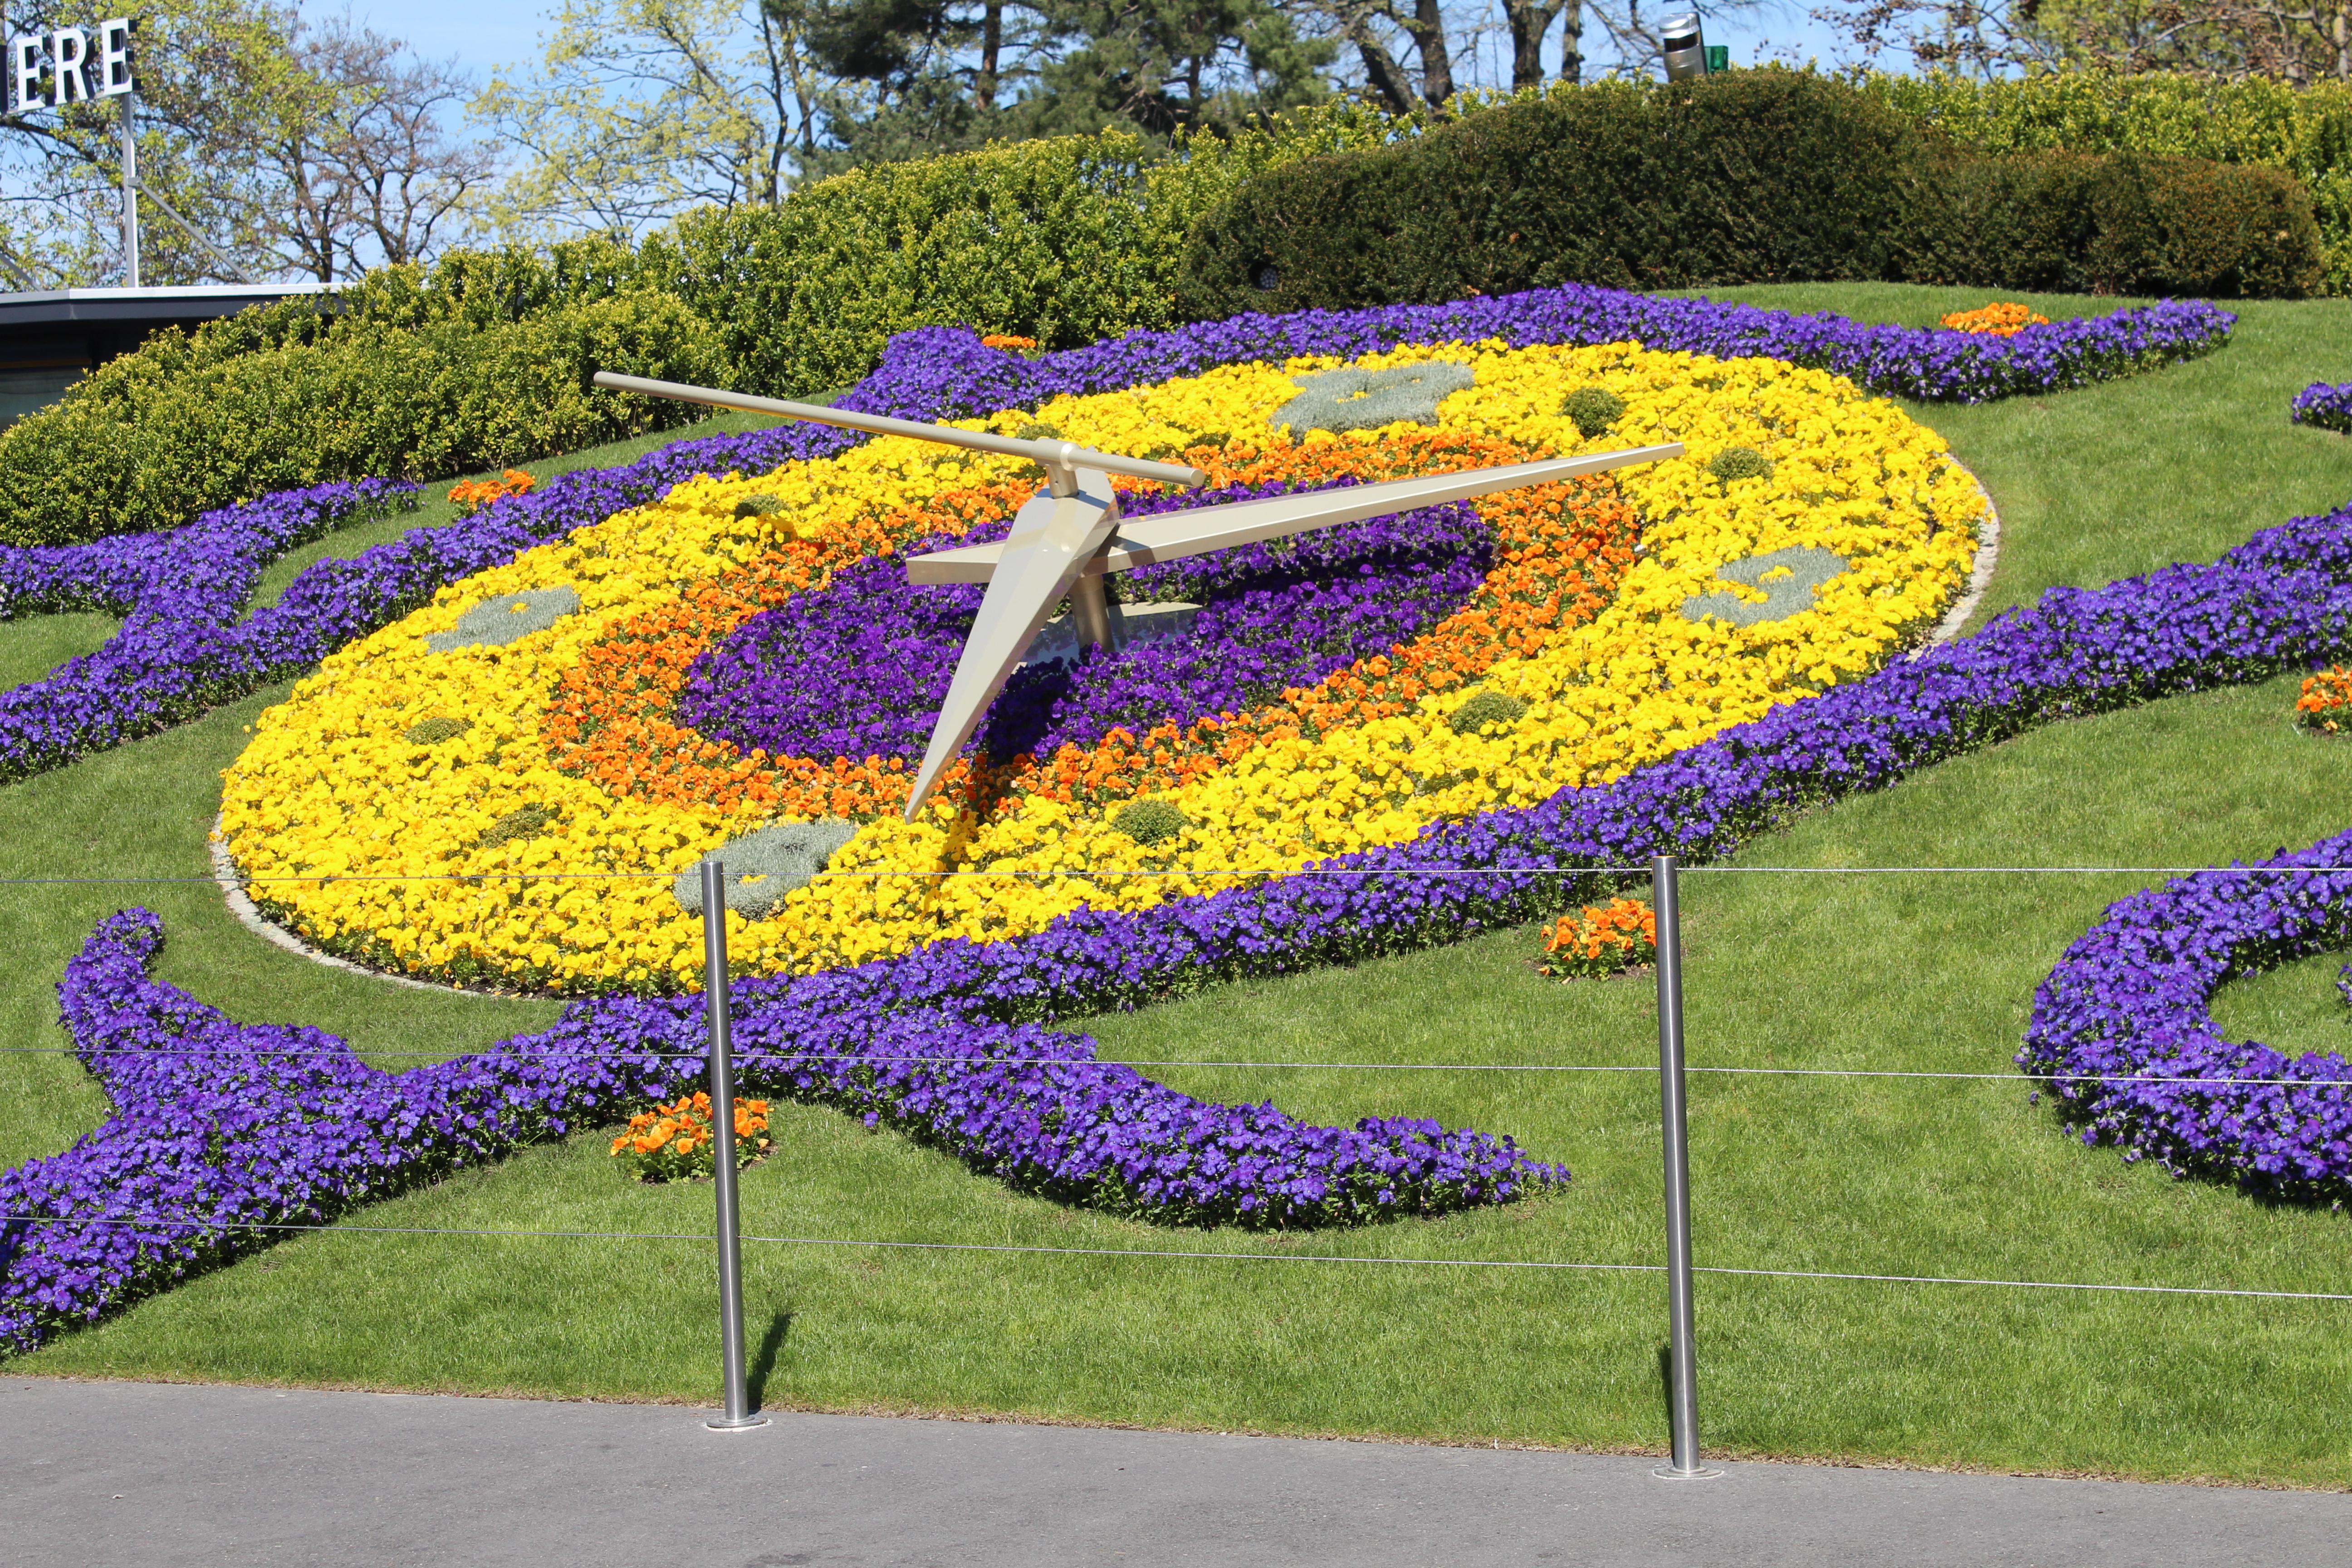 File Horloge Fleurie Parc Jardin Anglais Geneve 2 Jpg Wikimedia